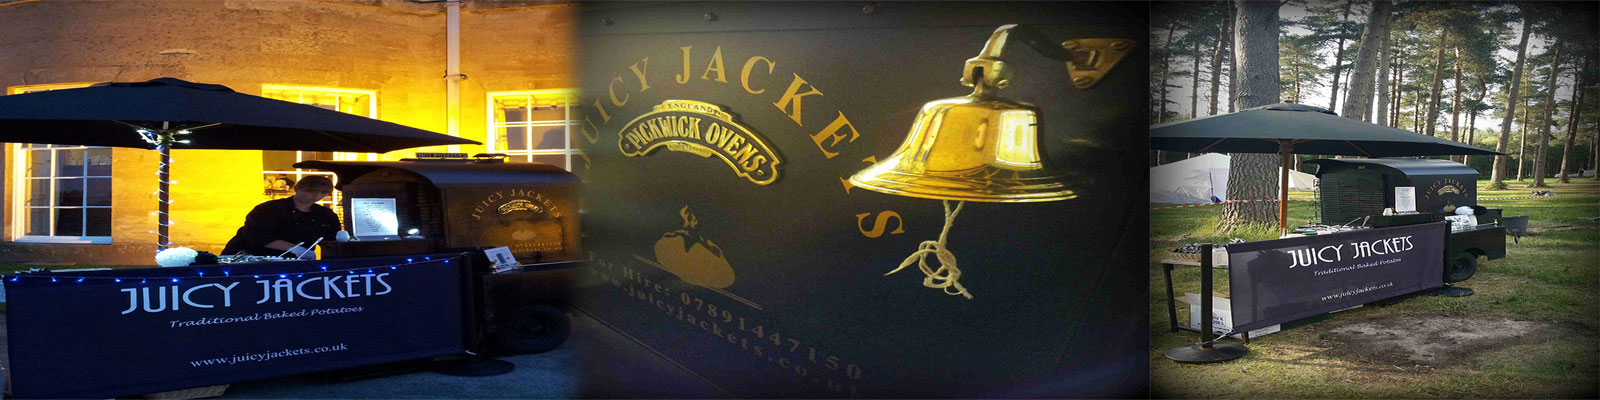 Juicy Jackets Price Promise